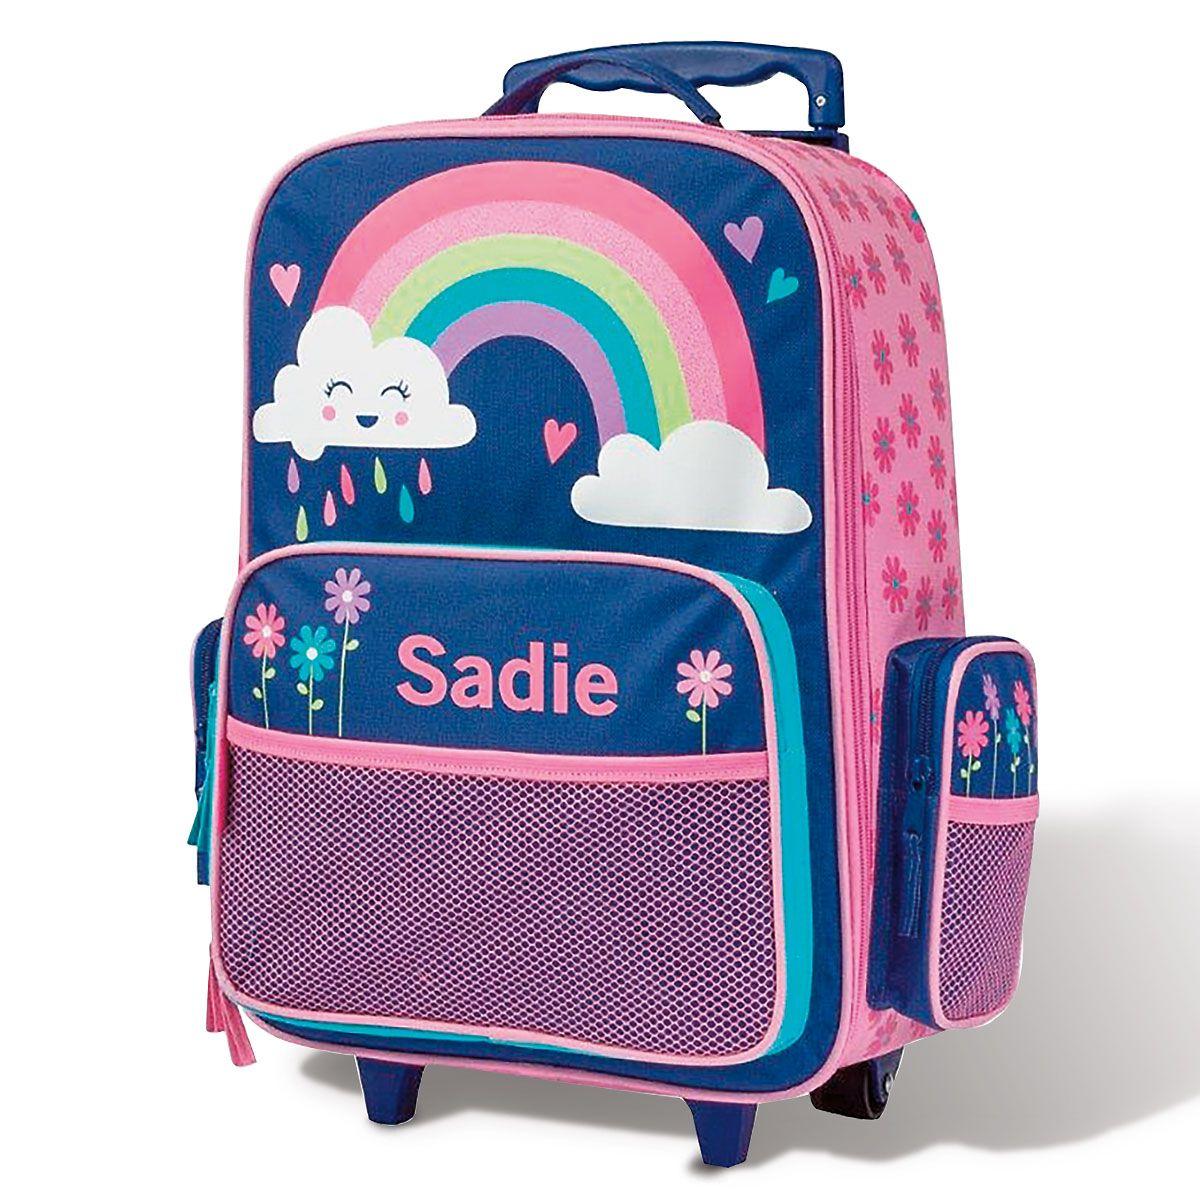 "Rainbow Rolling Luggage 18"" by Stephen Joseph®"